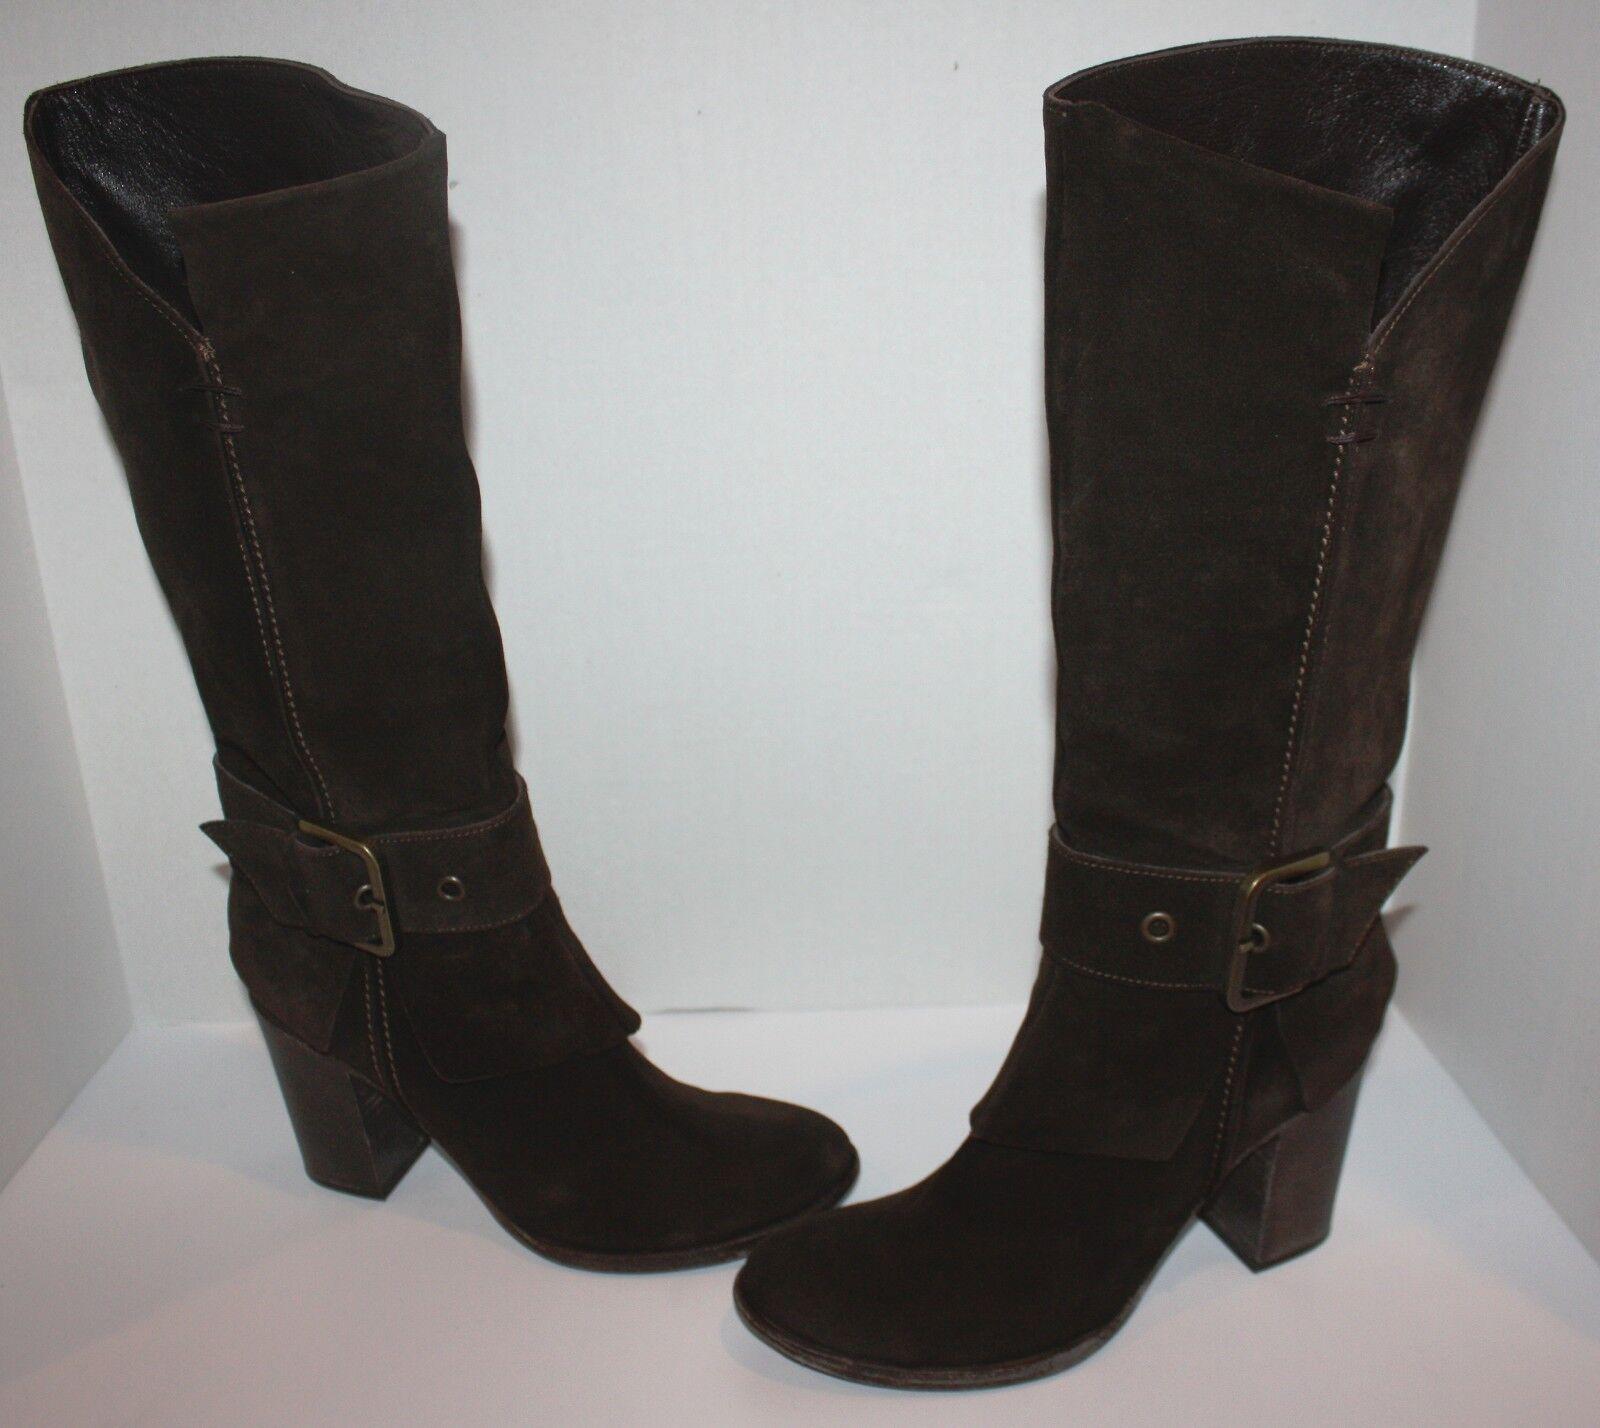 Para Mujer ahora Italia Marrón Gamuza botas botas botas Talla 39,5   Us 9.5 dac117